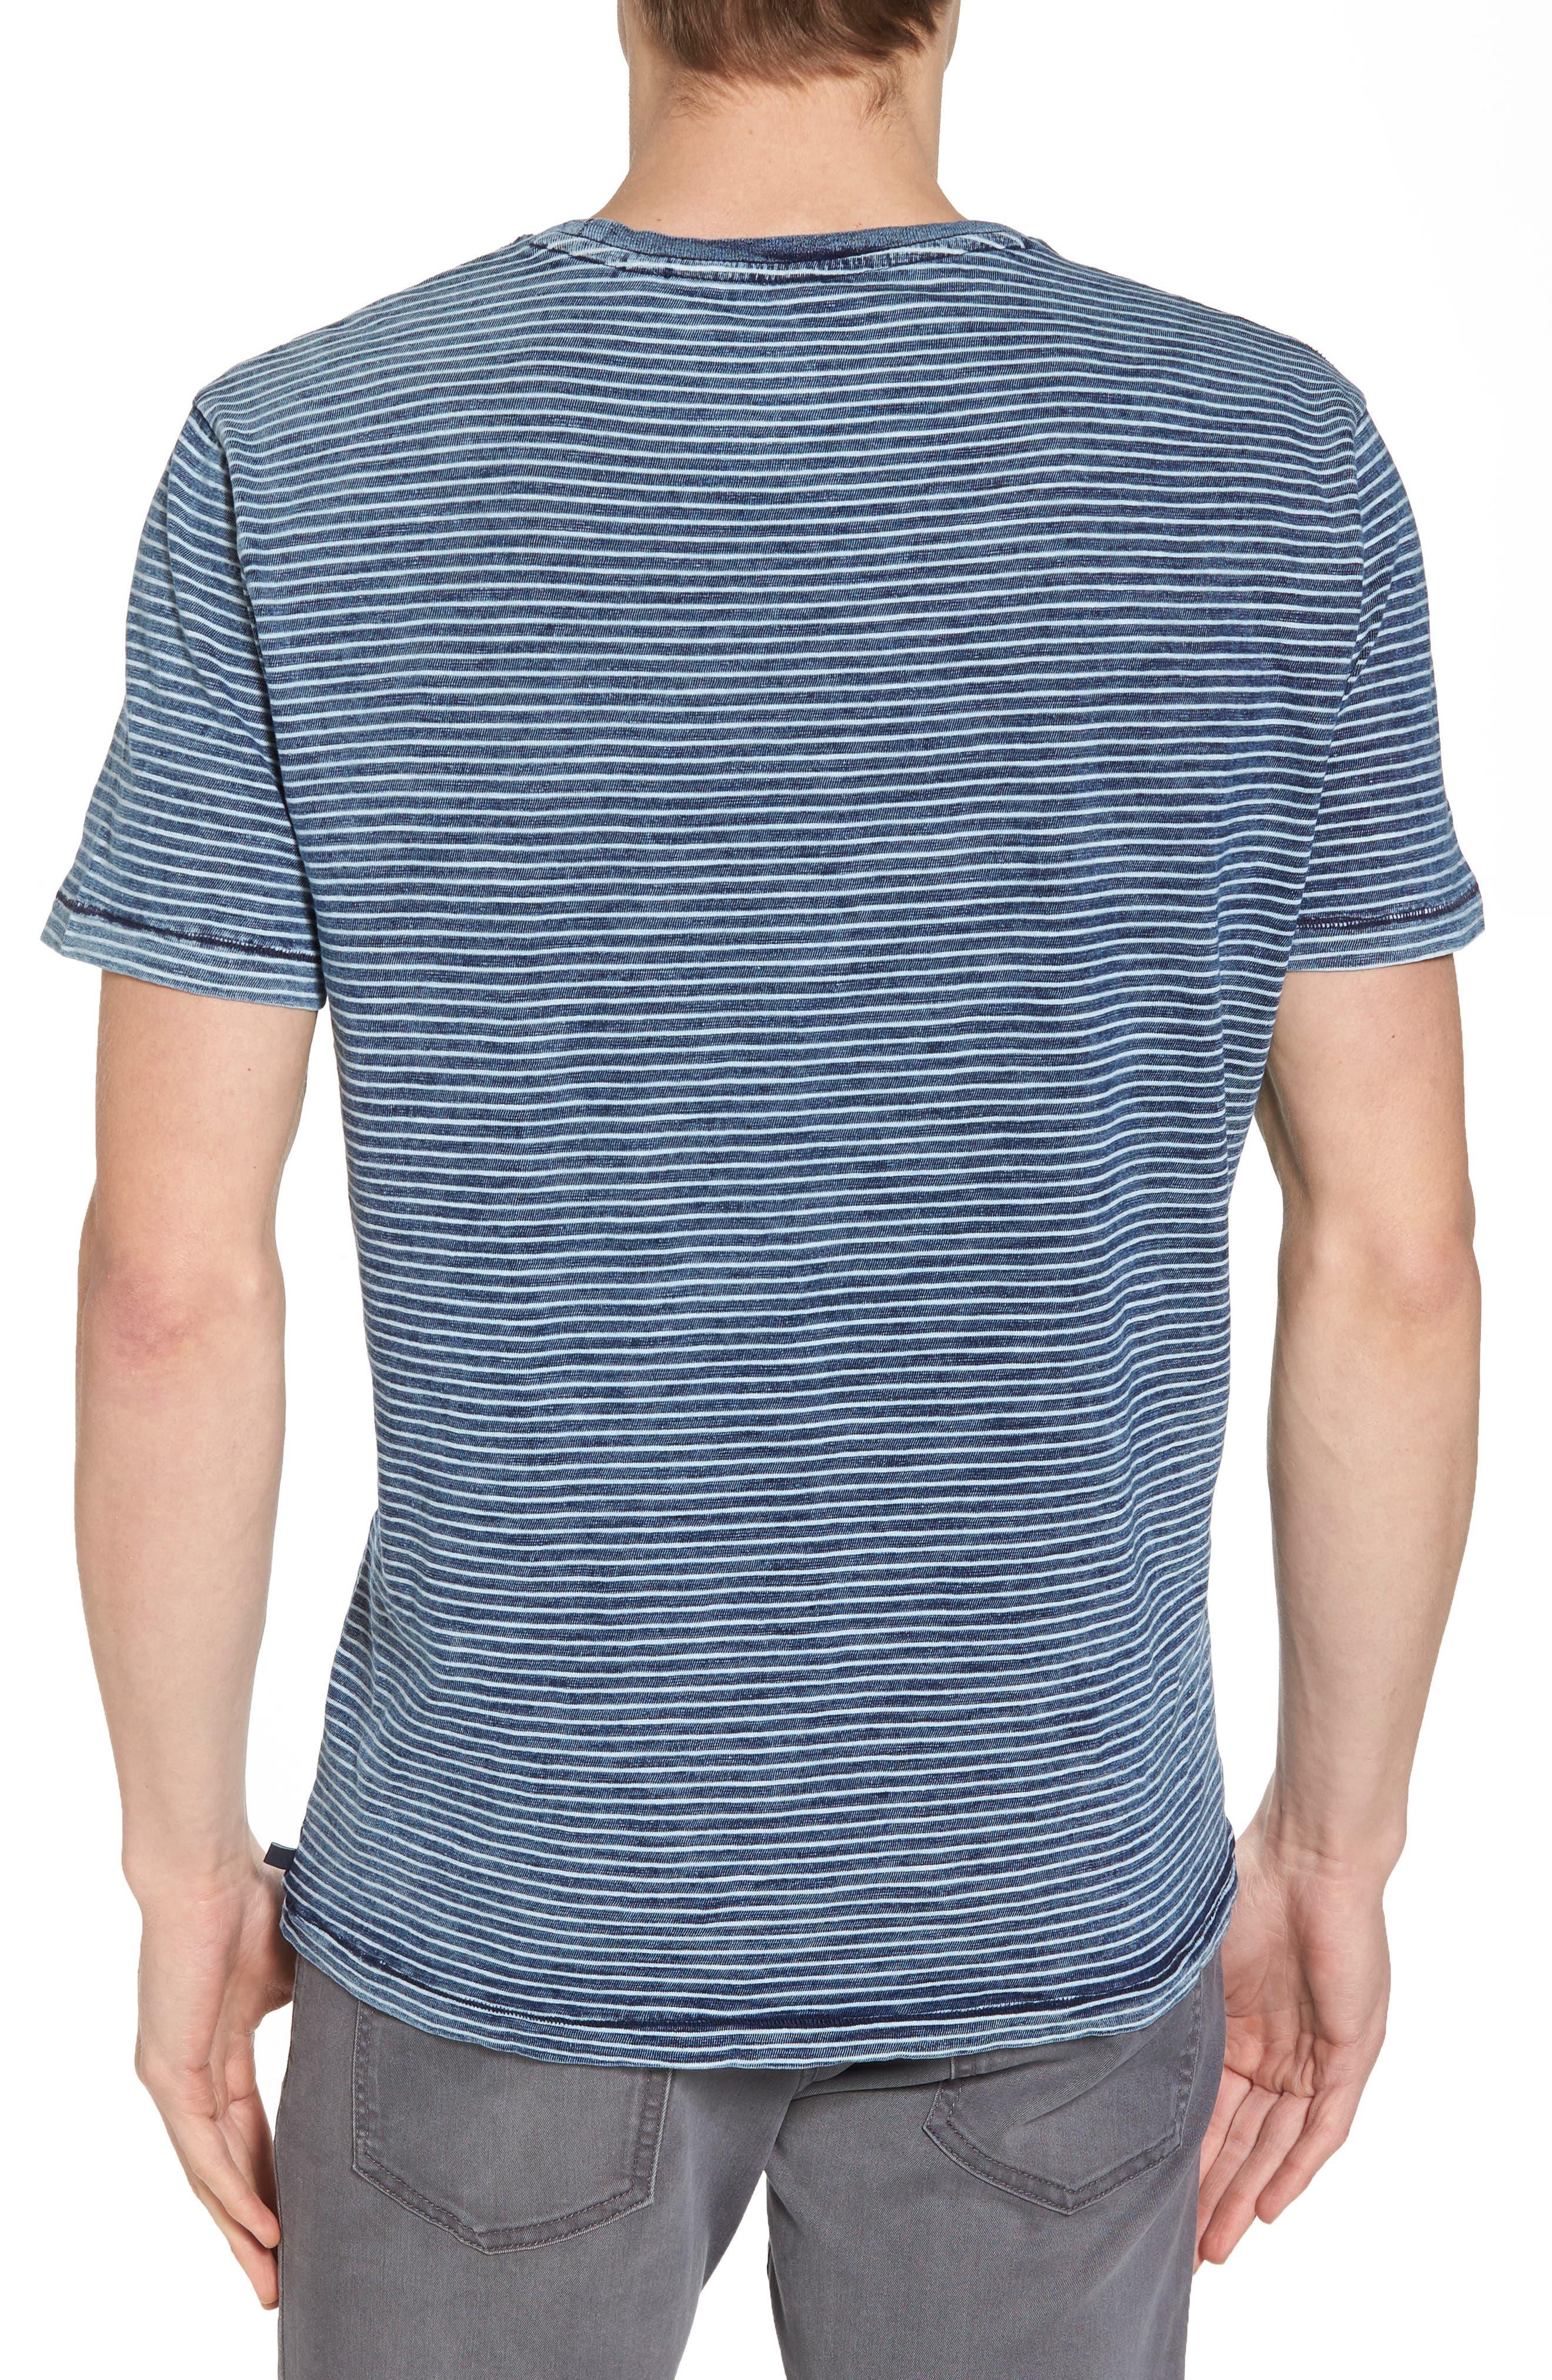 Julian Slim Fit Crewneck Shirt,                             Alternate thumbnail 2, color,                             Marbled Indigo/ White Stripe